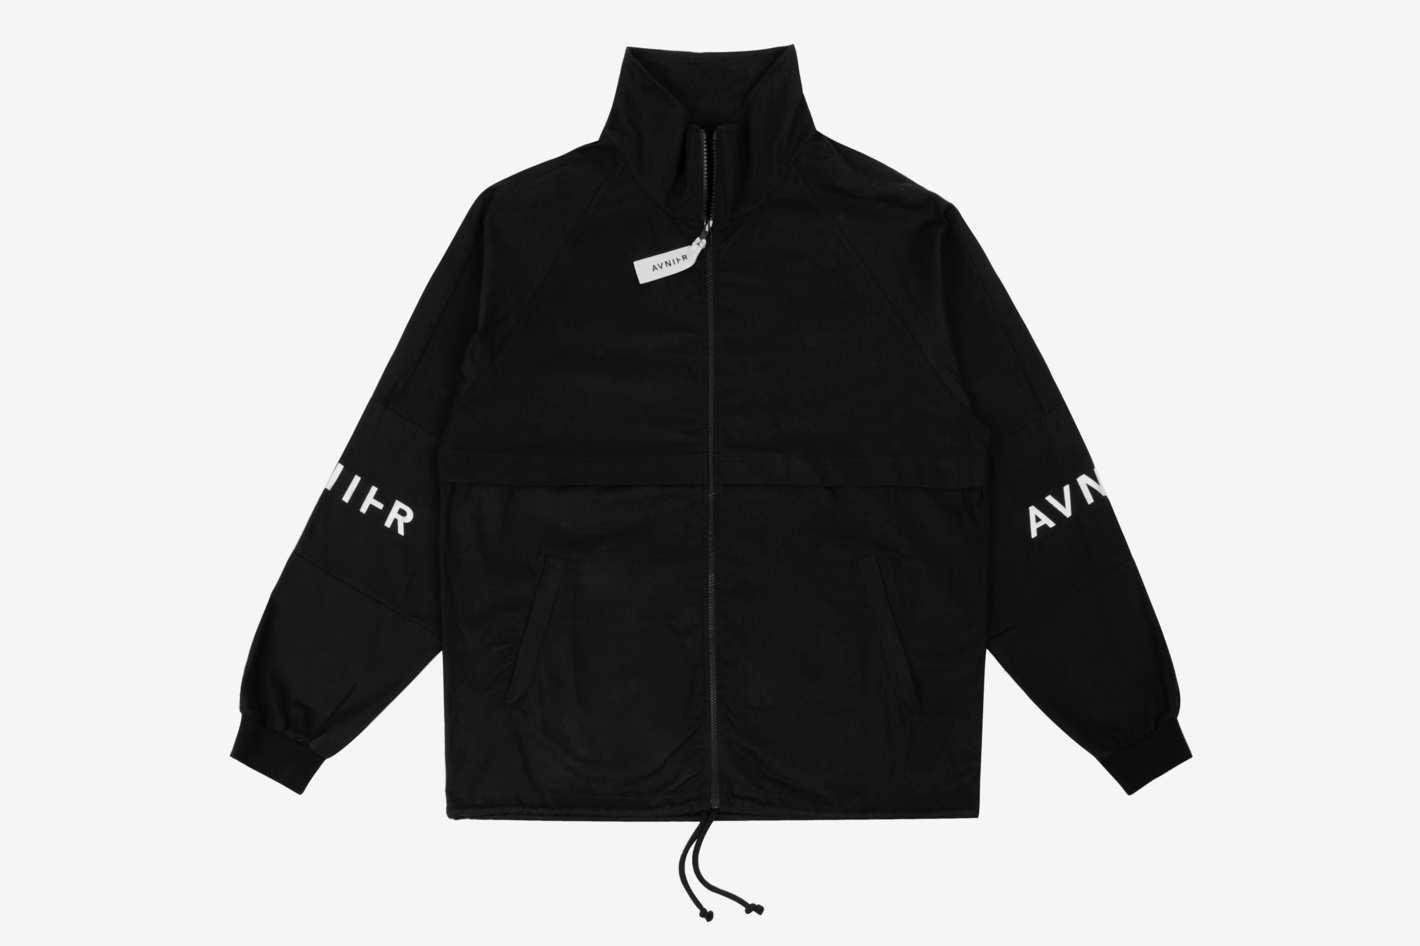 Avnier Live Jacket